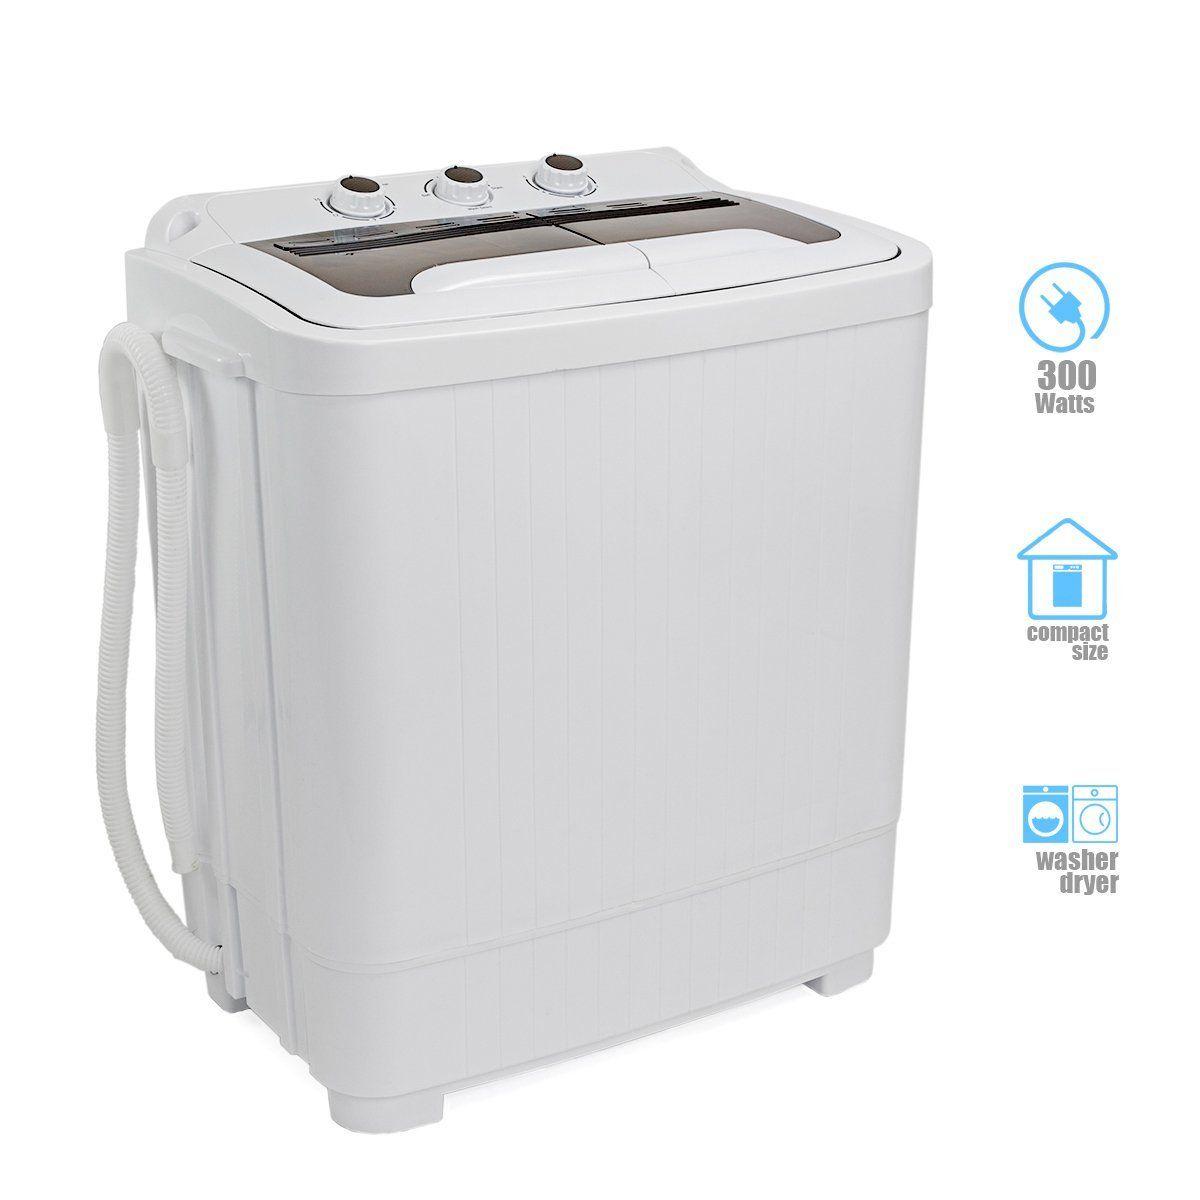 Xtremepowerus Xtremepowerus Portable Compact Washing Machine And